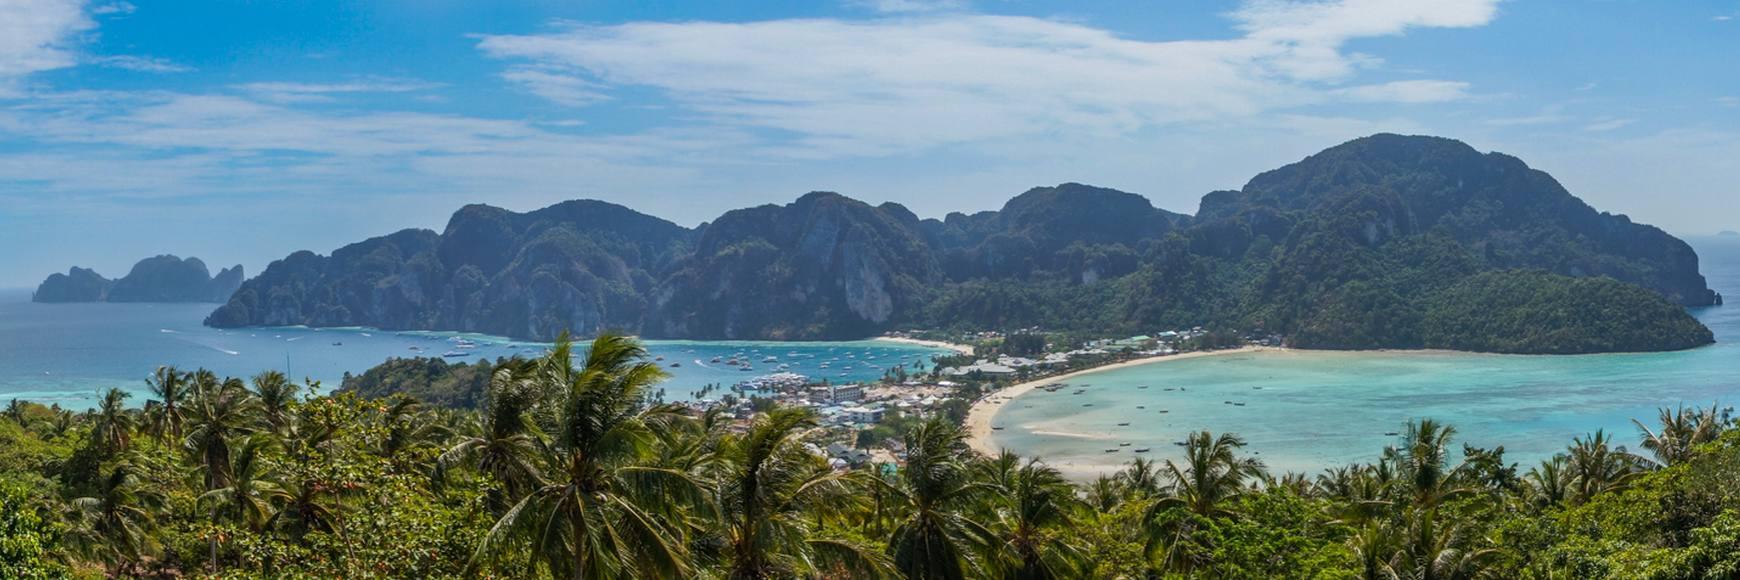 noleggio barca a vela Tailandia